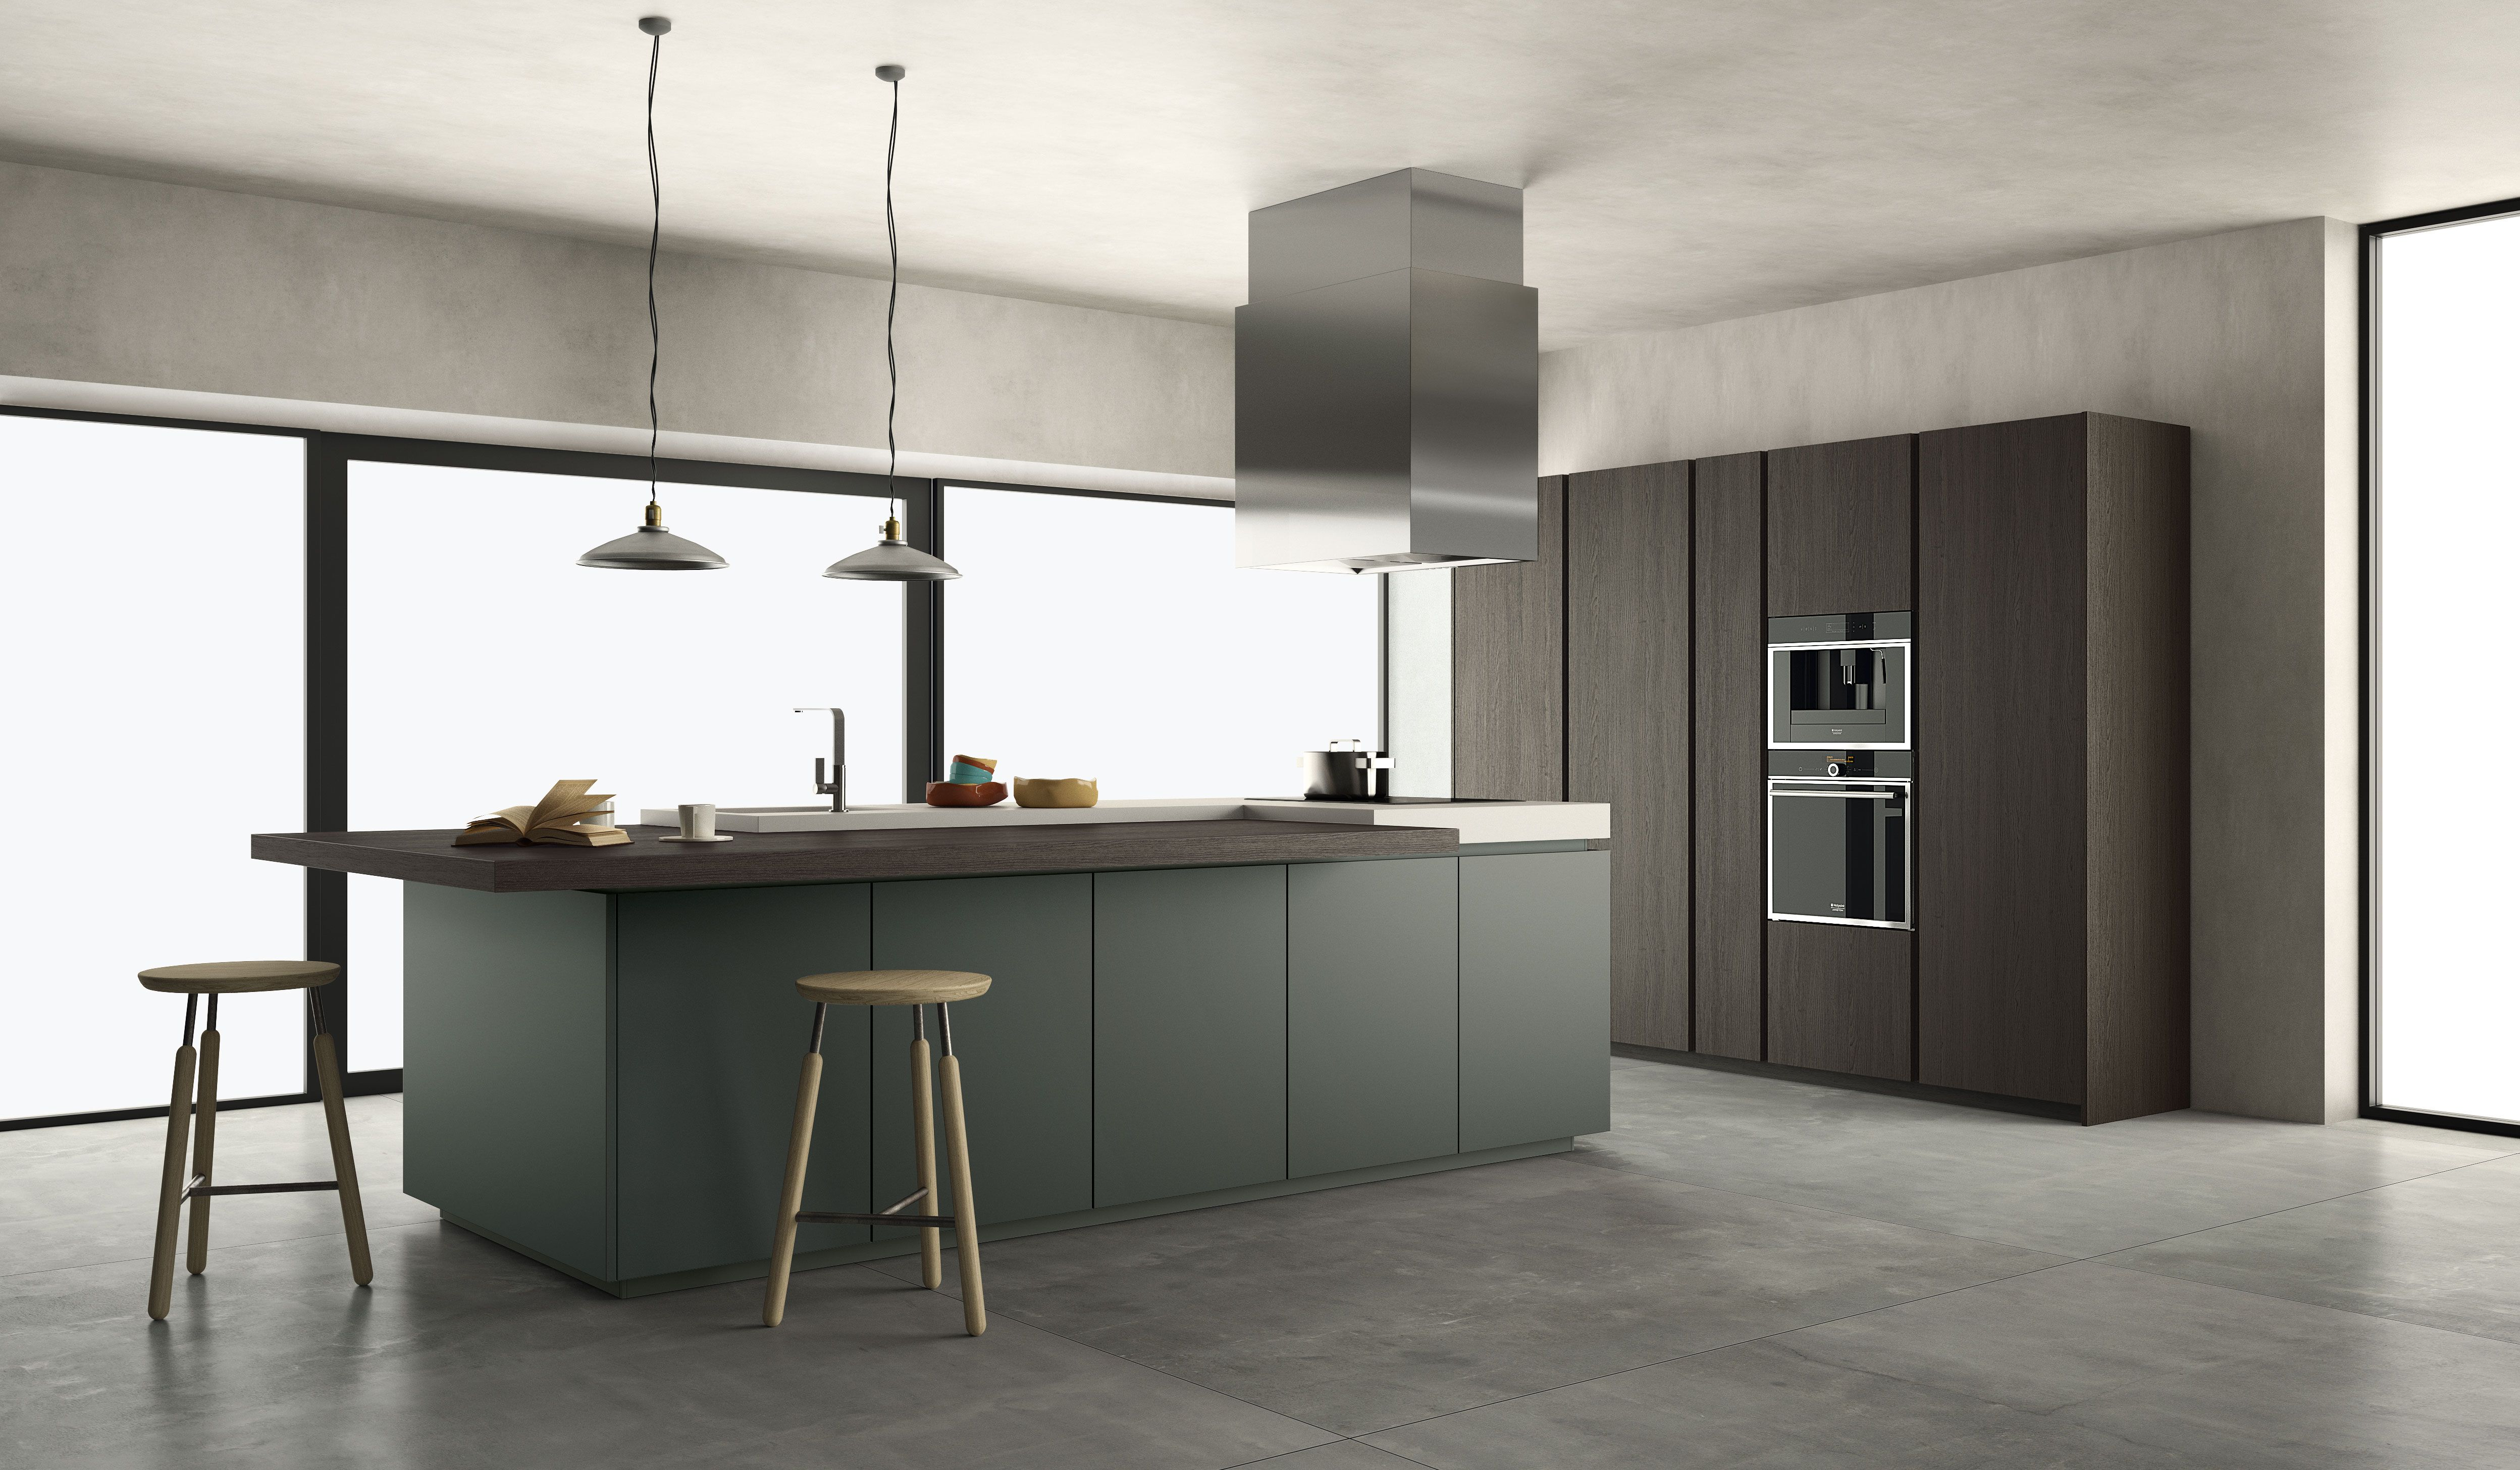 Newarrivals Doimo Cucine Kitchen Inspiration Design